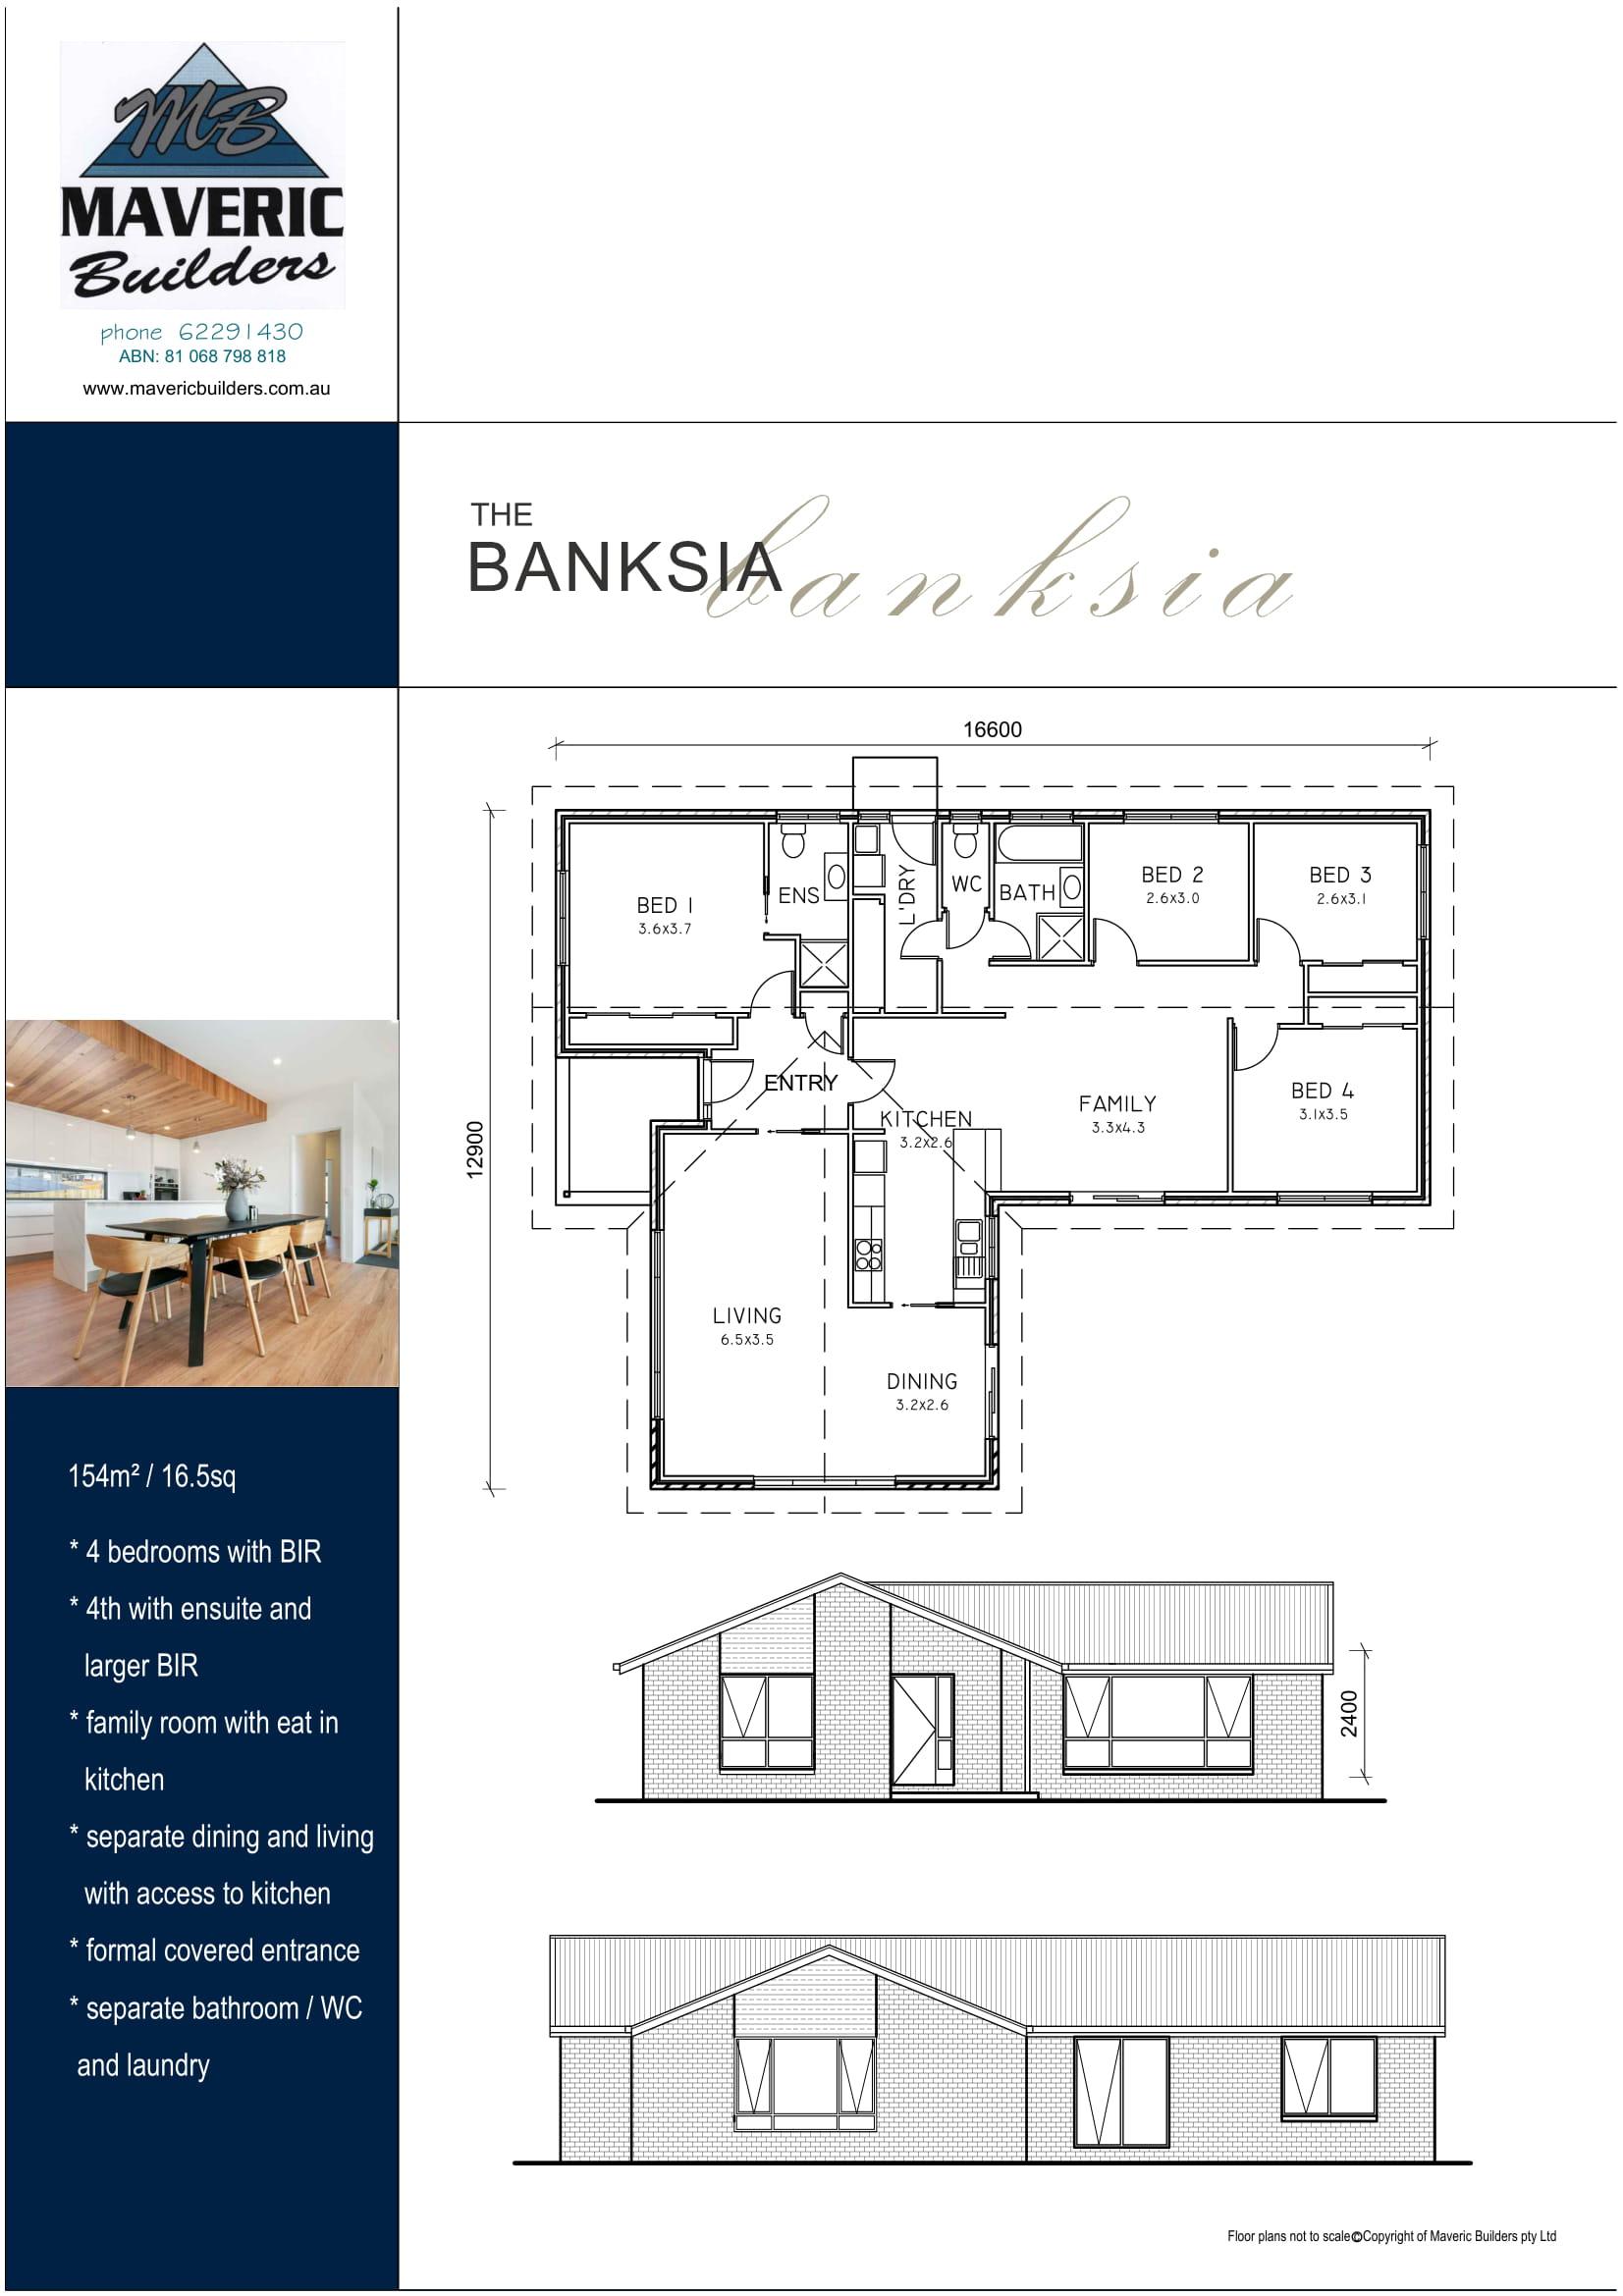 A4 Brochures 2019 01 - 24-14.jpg